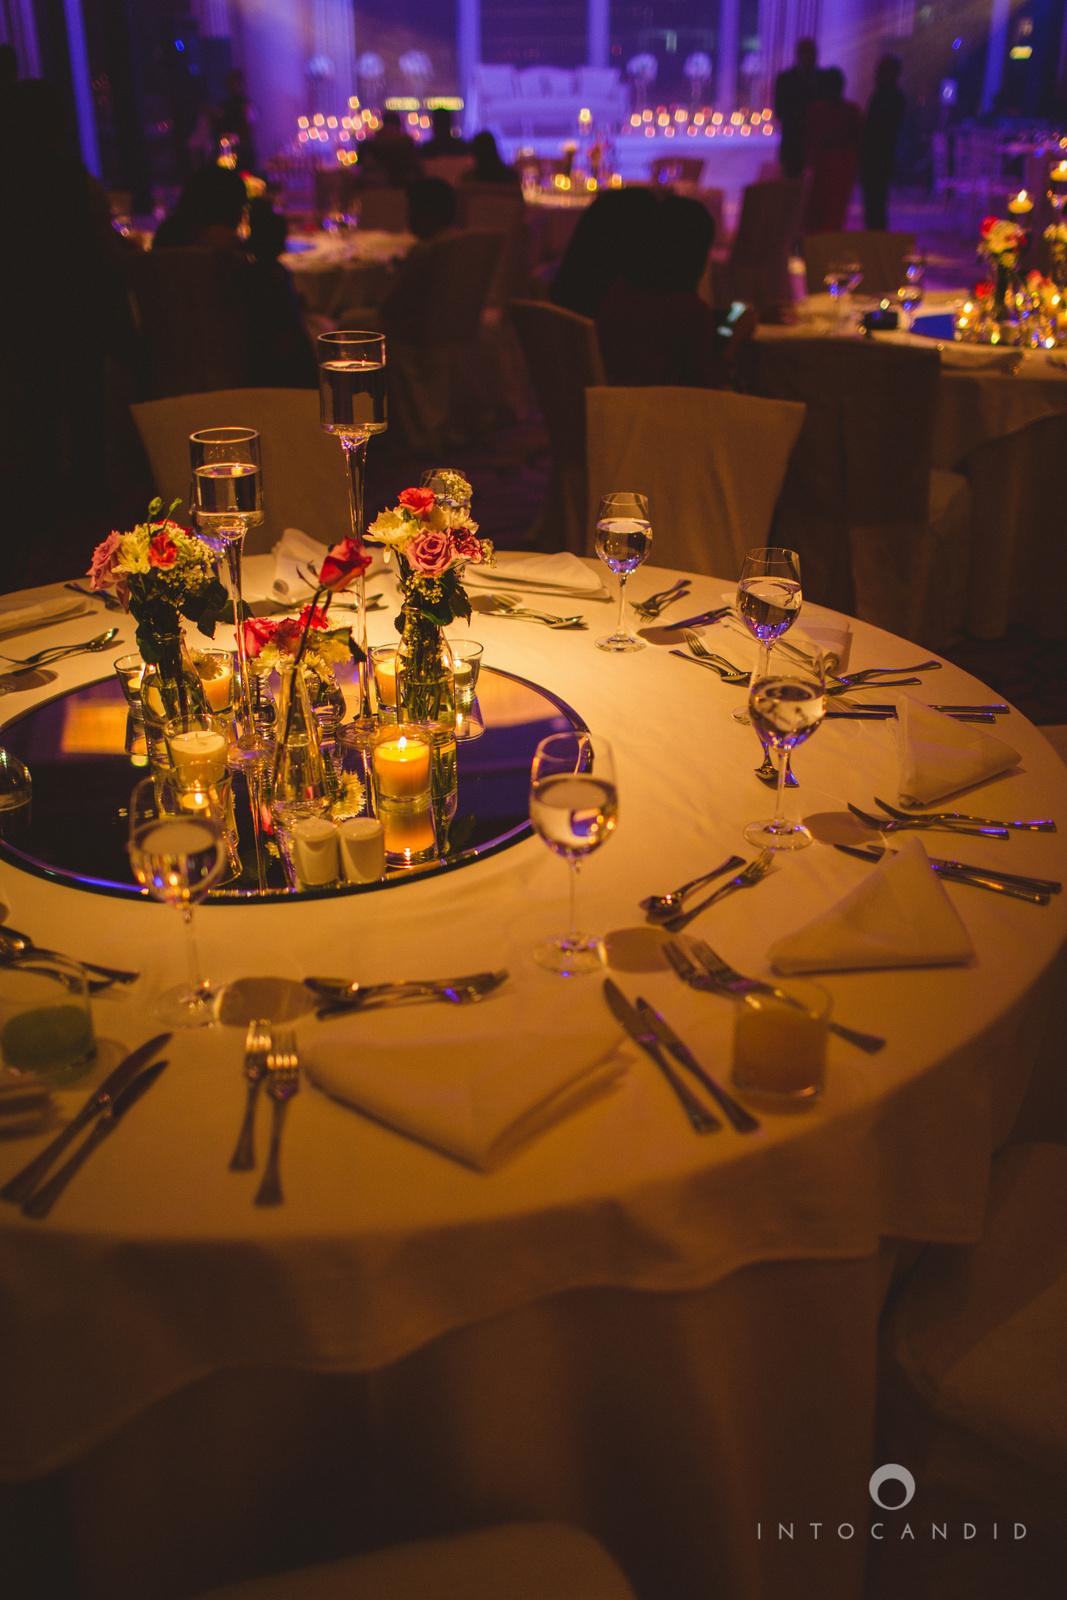 dubai-01-wedding-reception-photographers-theaddress-downtown-dubai-intocandid-photography1731.jpg